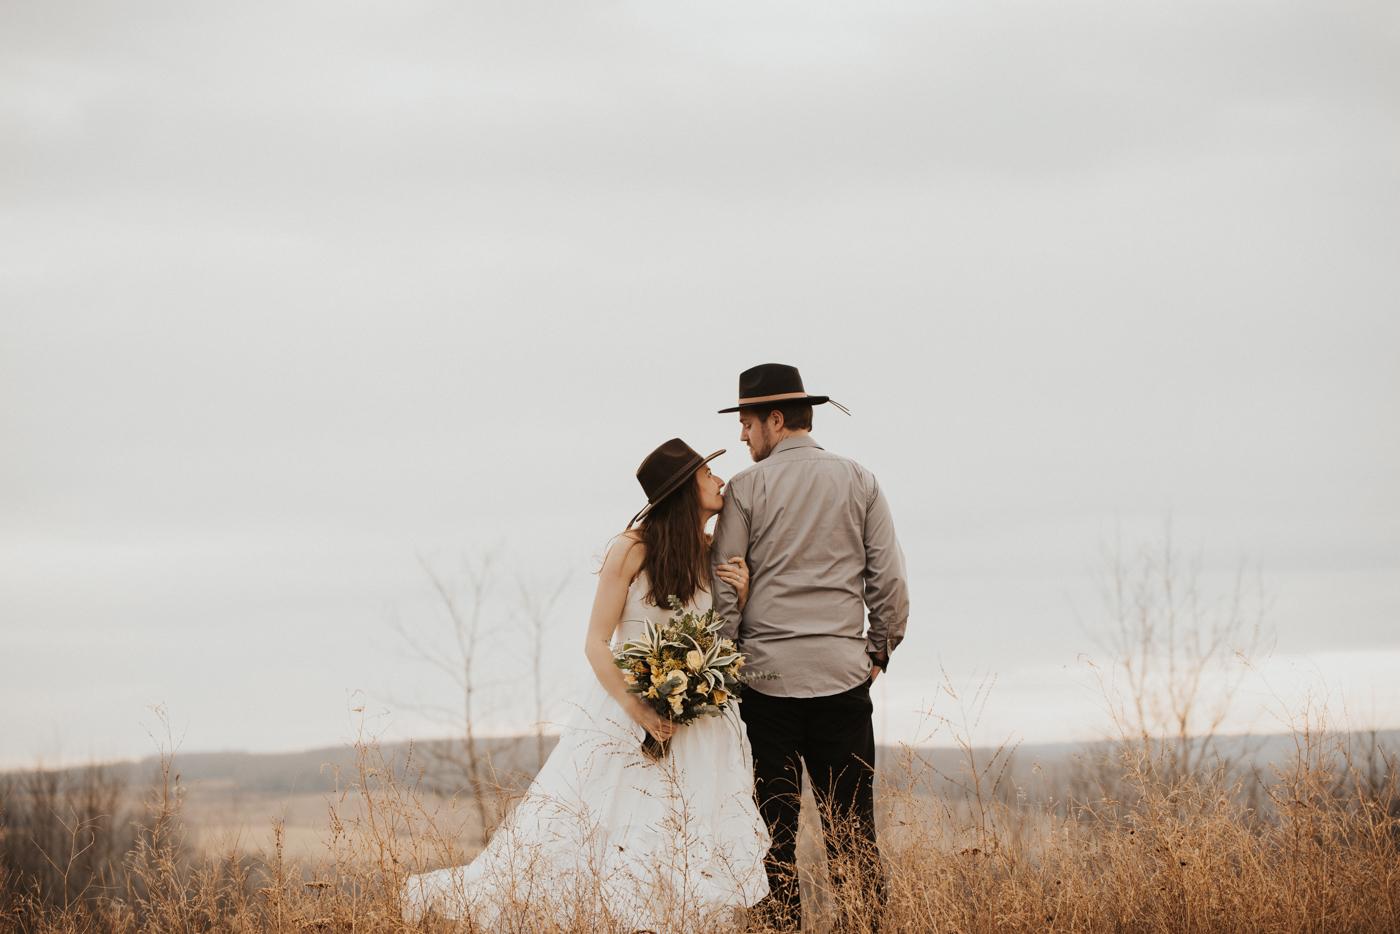 FortSt.John_photographer_TyraEPhotography_Wedding_Couple_Family_Photograhy_DawsonCreek_Elopement_Bride_Boduoir_Portraits-36.jpg